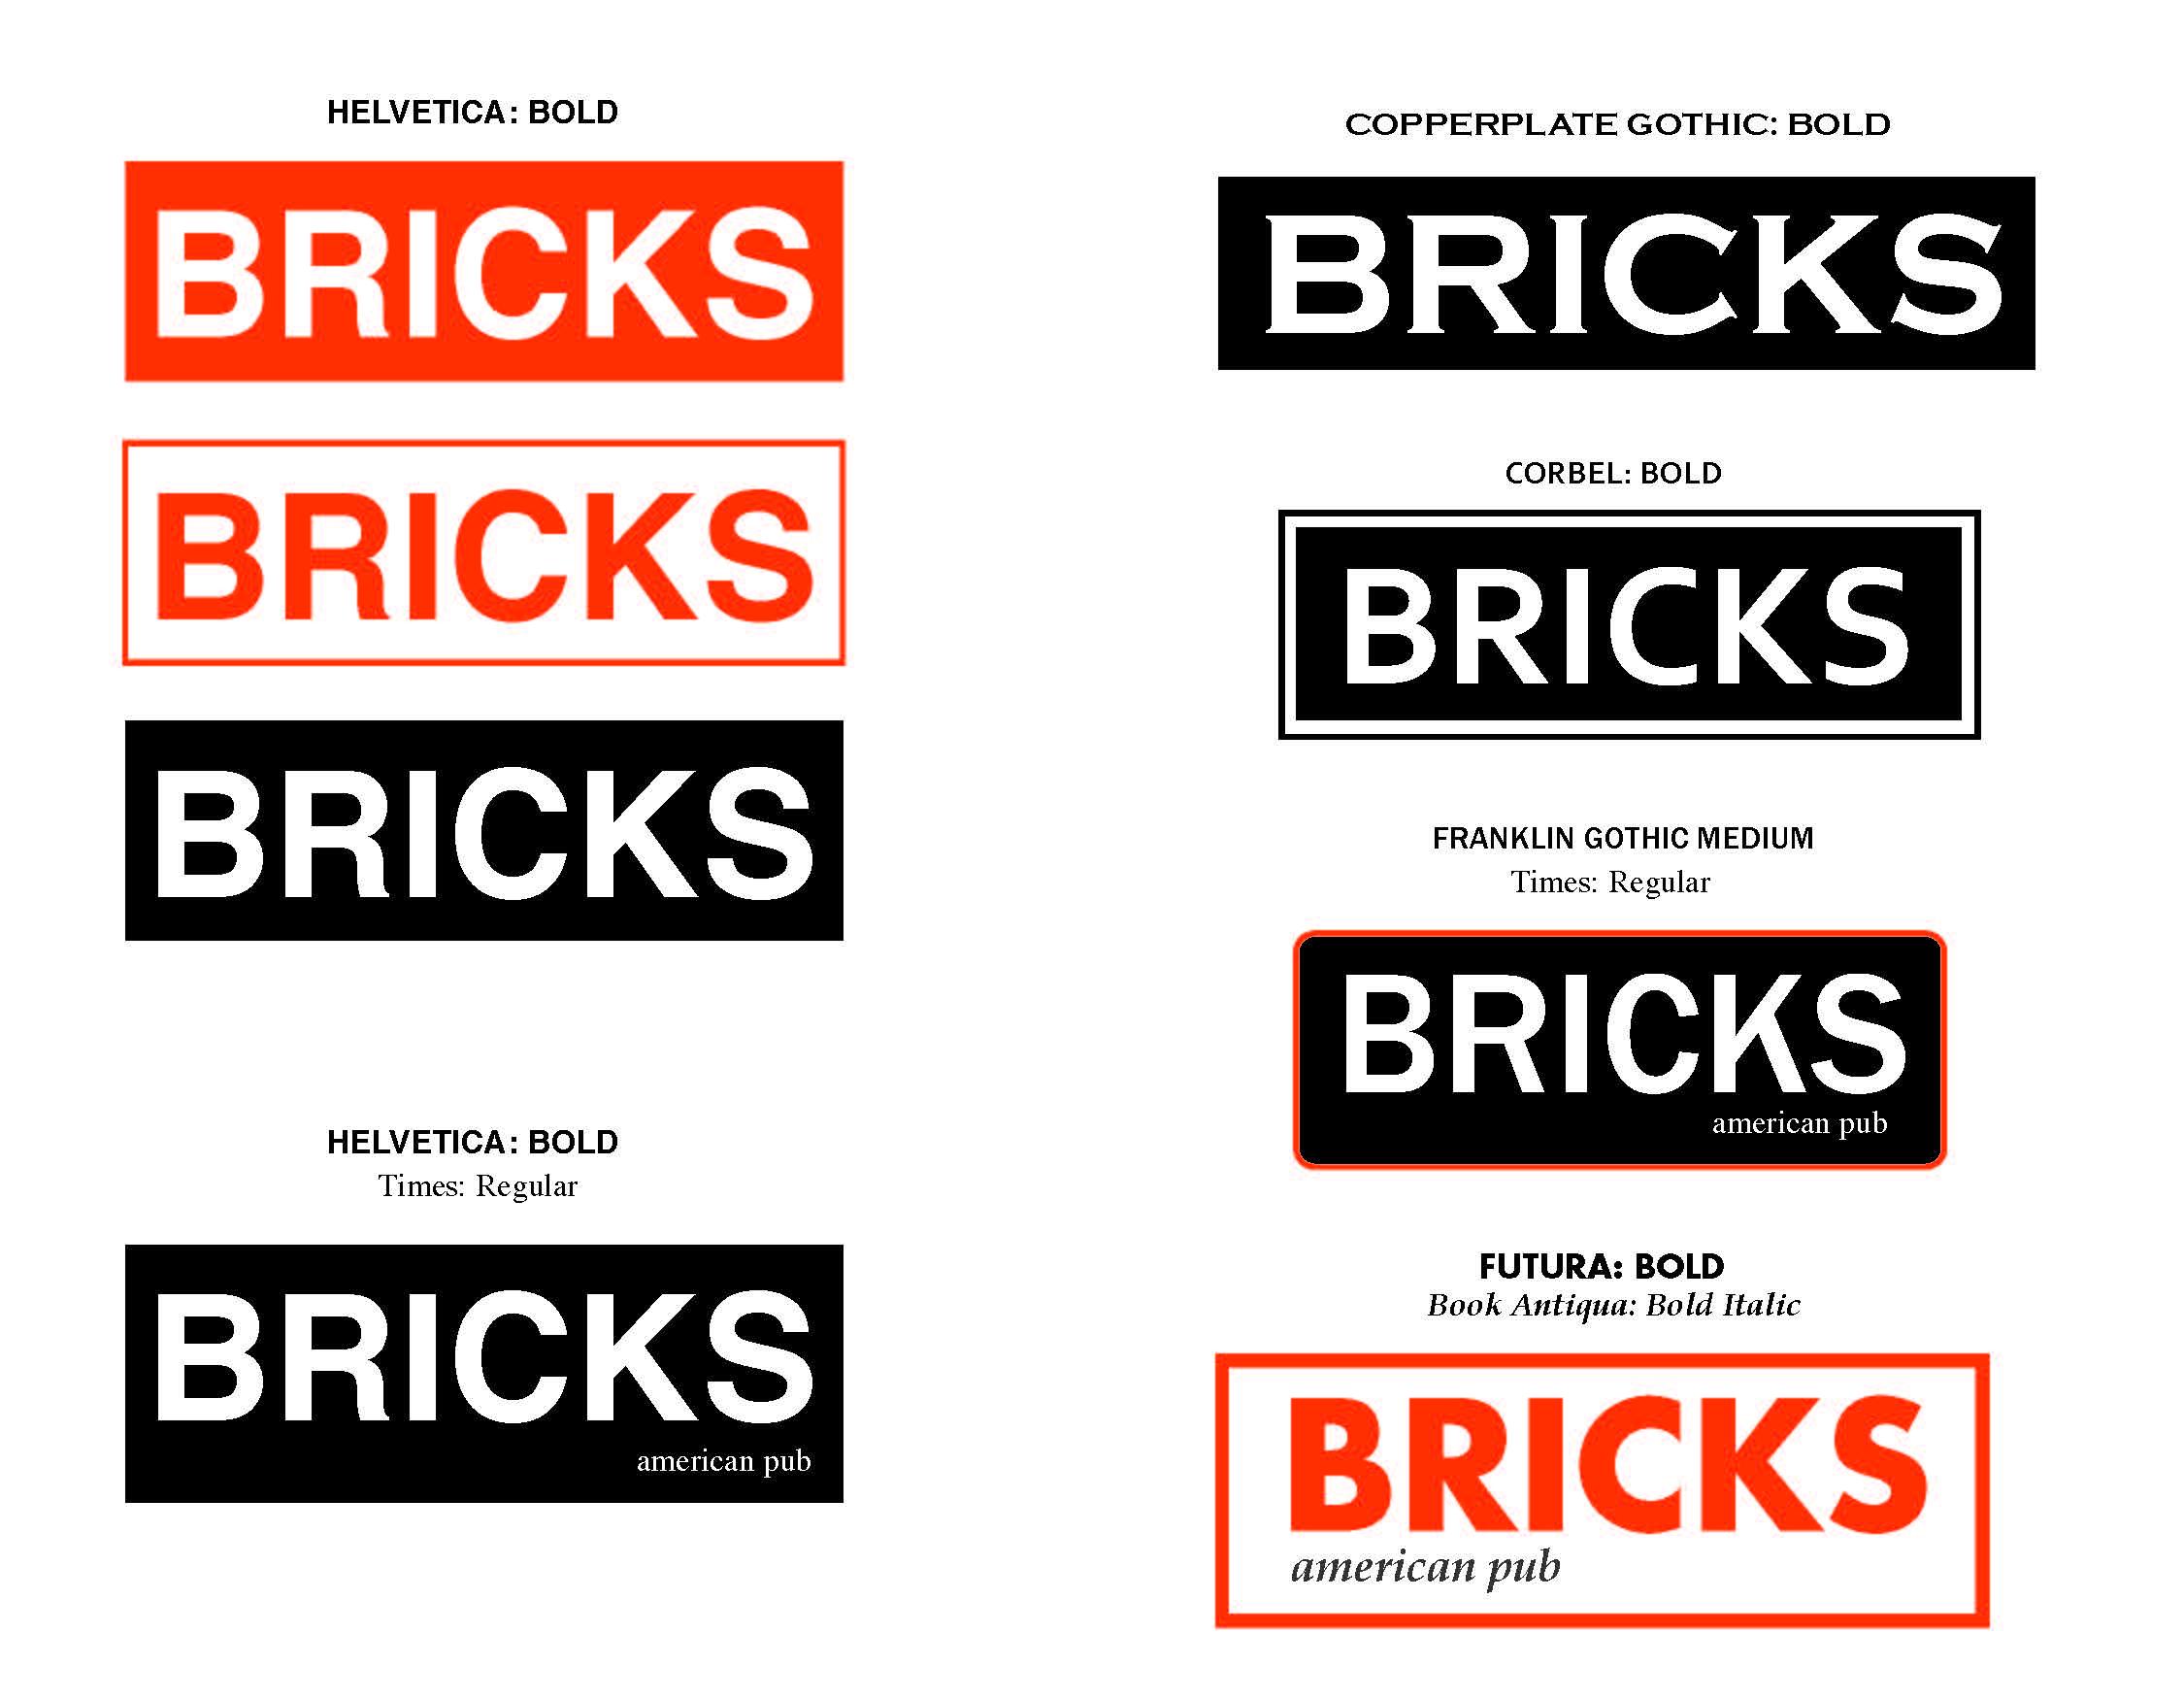 bricks_new_logo_options.jpg